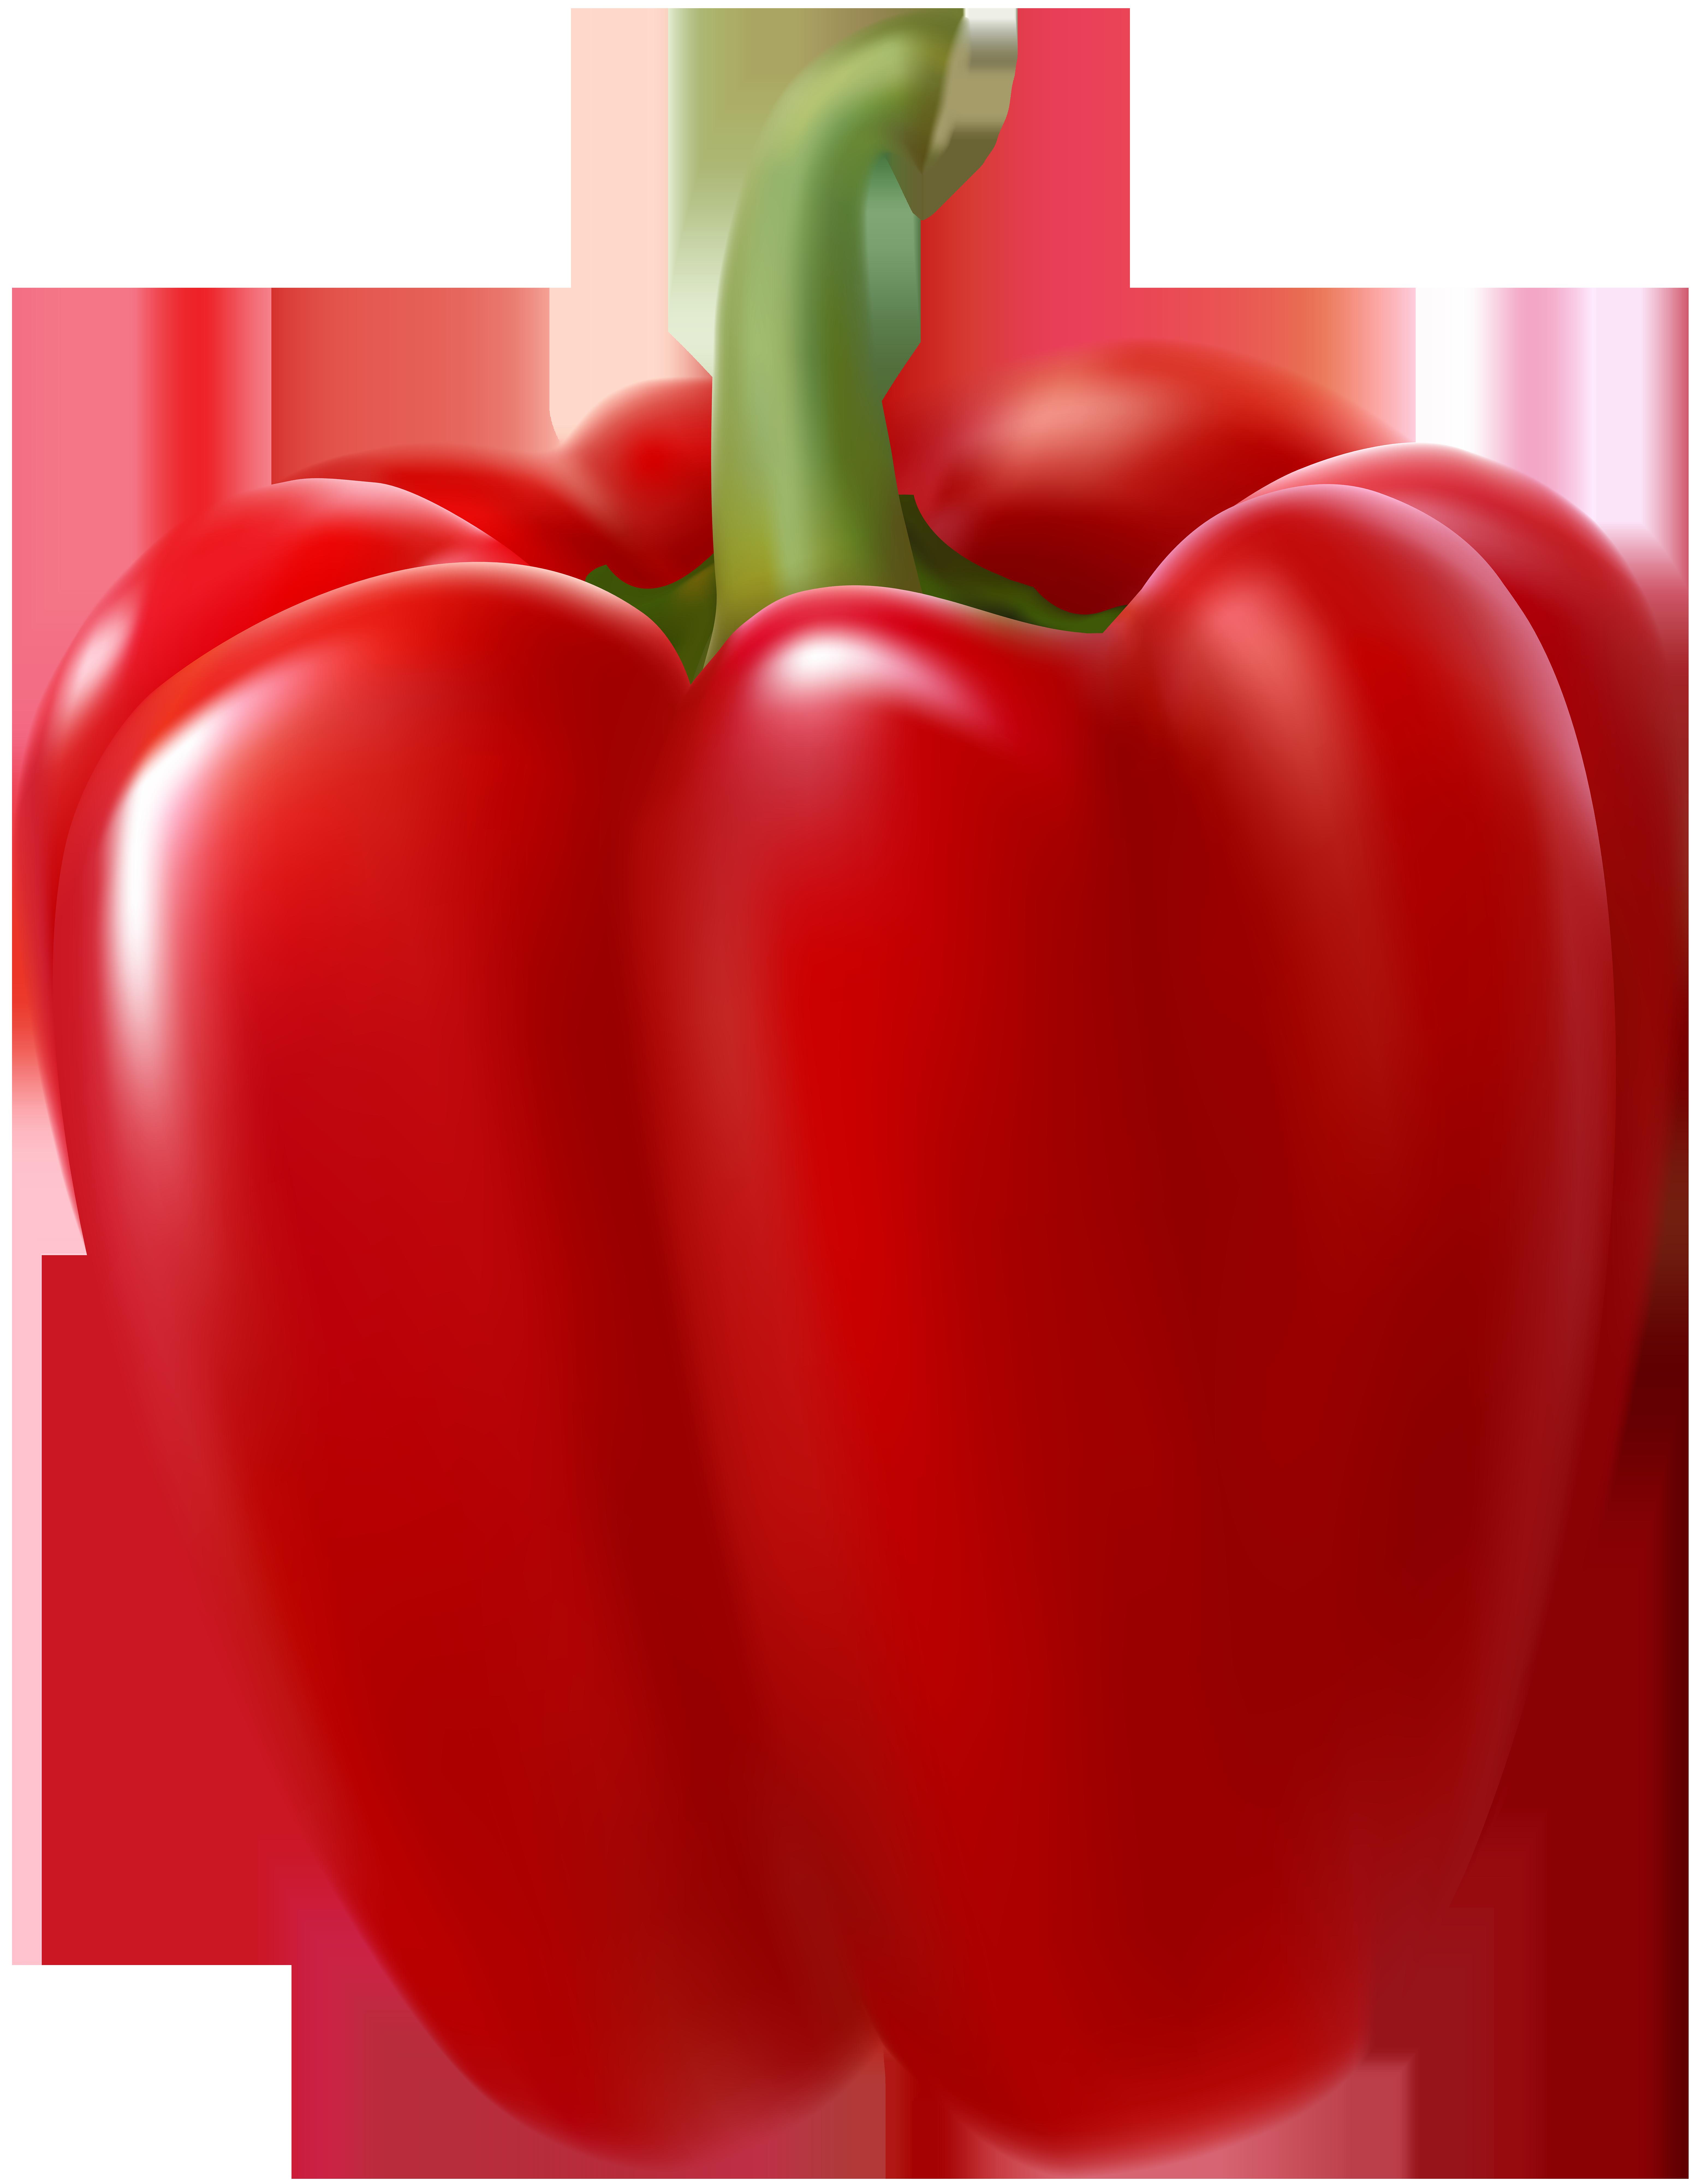 Red Bell Pepper Transparent Clip Art Image.